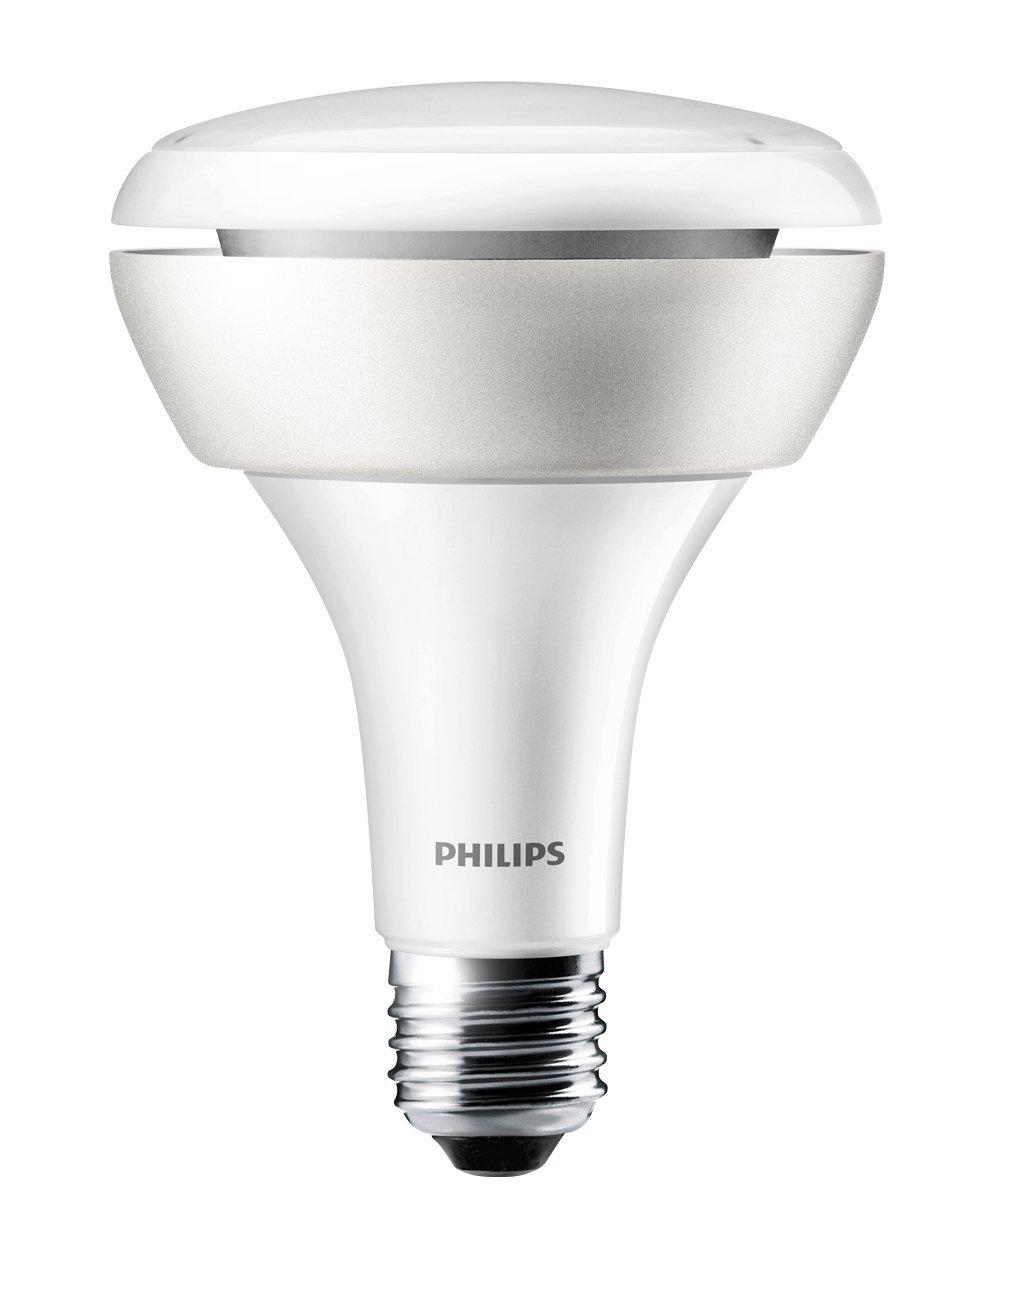 Philips Hue 65W Equivalent BR30 Single LED Light Bulb (432690 ...